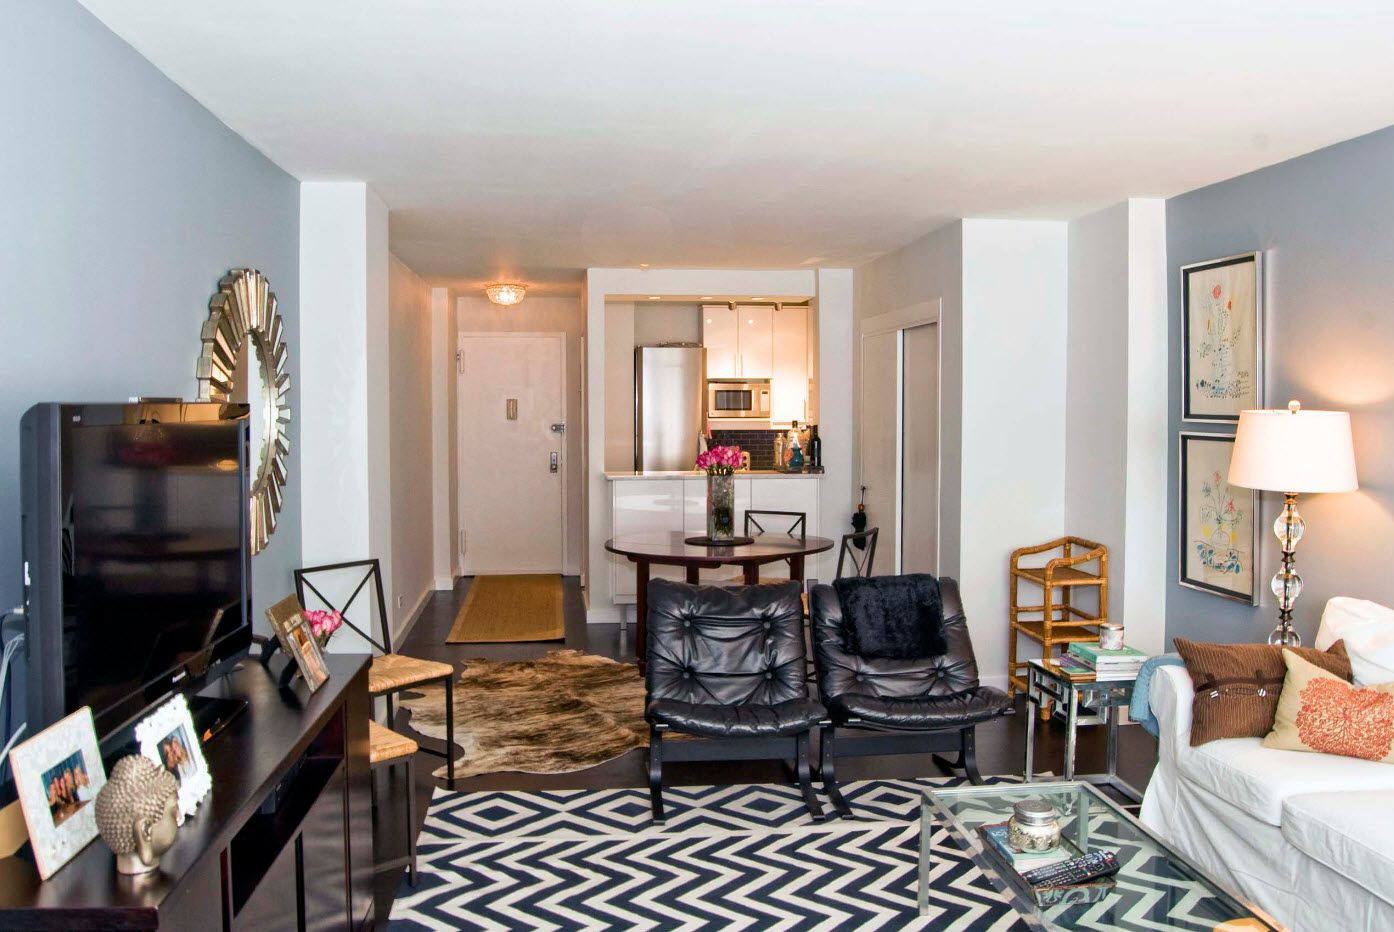 Zebra colored rug for the modern minimalistic room